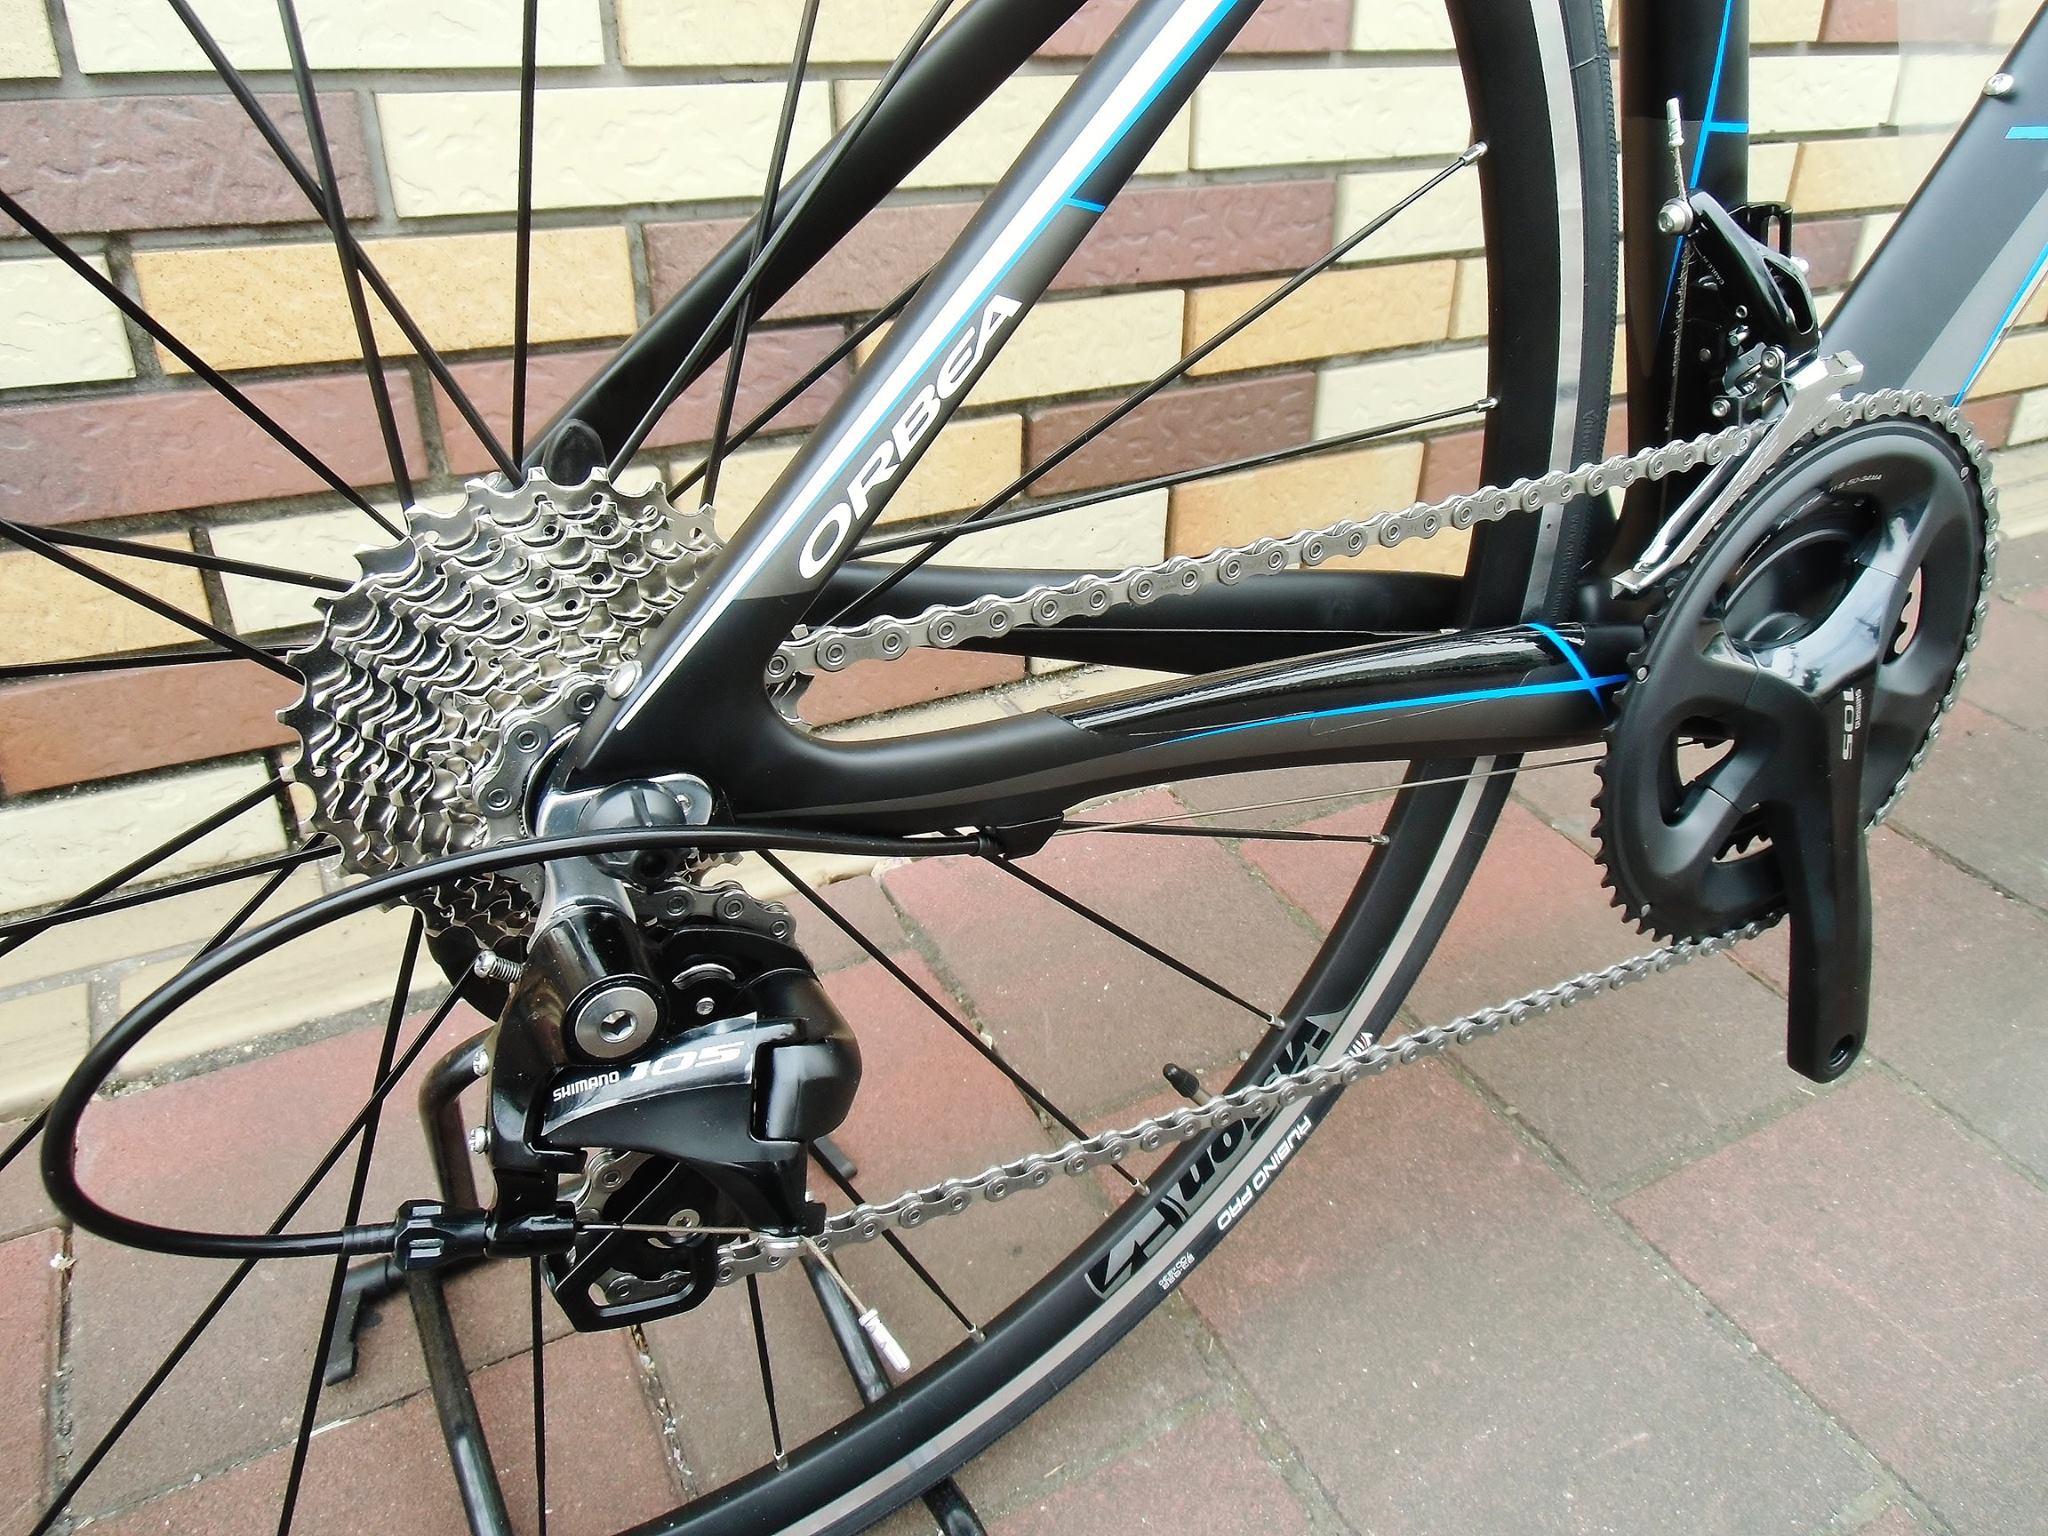 2015 2016 ORBEA AVANT OME オルベア スペインメーカー フルカーボンロードバイク ツーリング サイクリング ロングライド シマノ105 広島県福山市